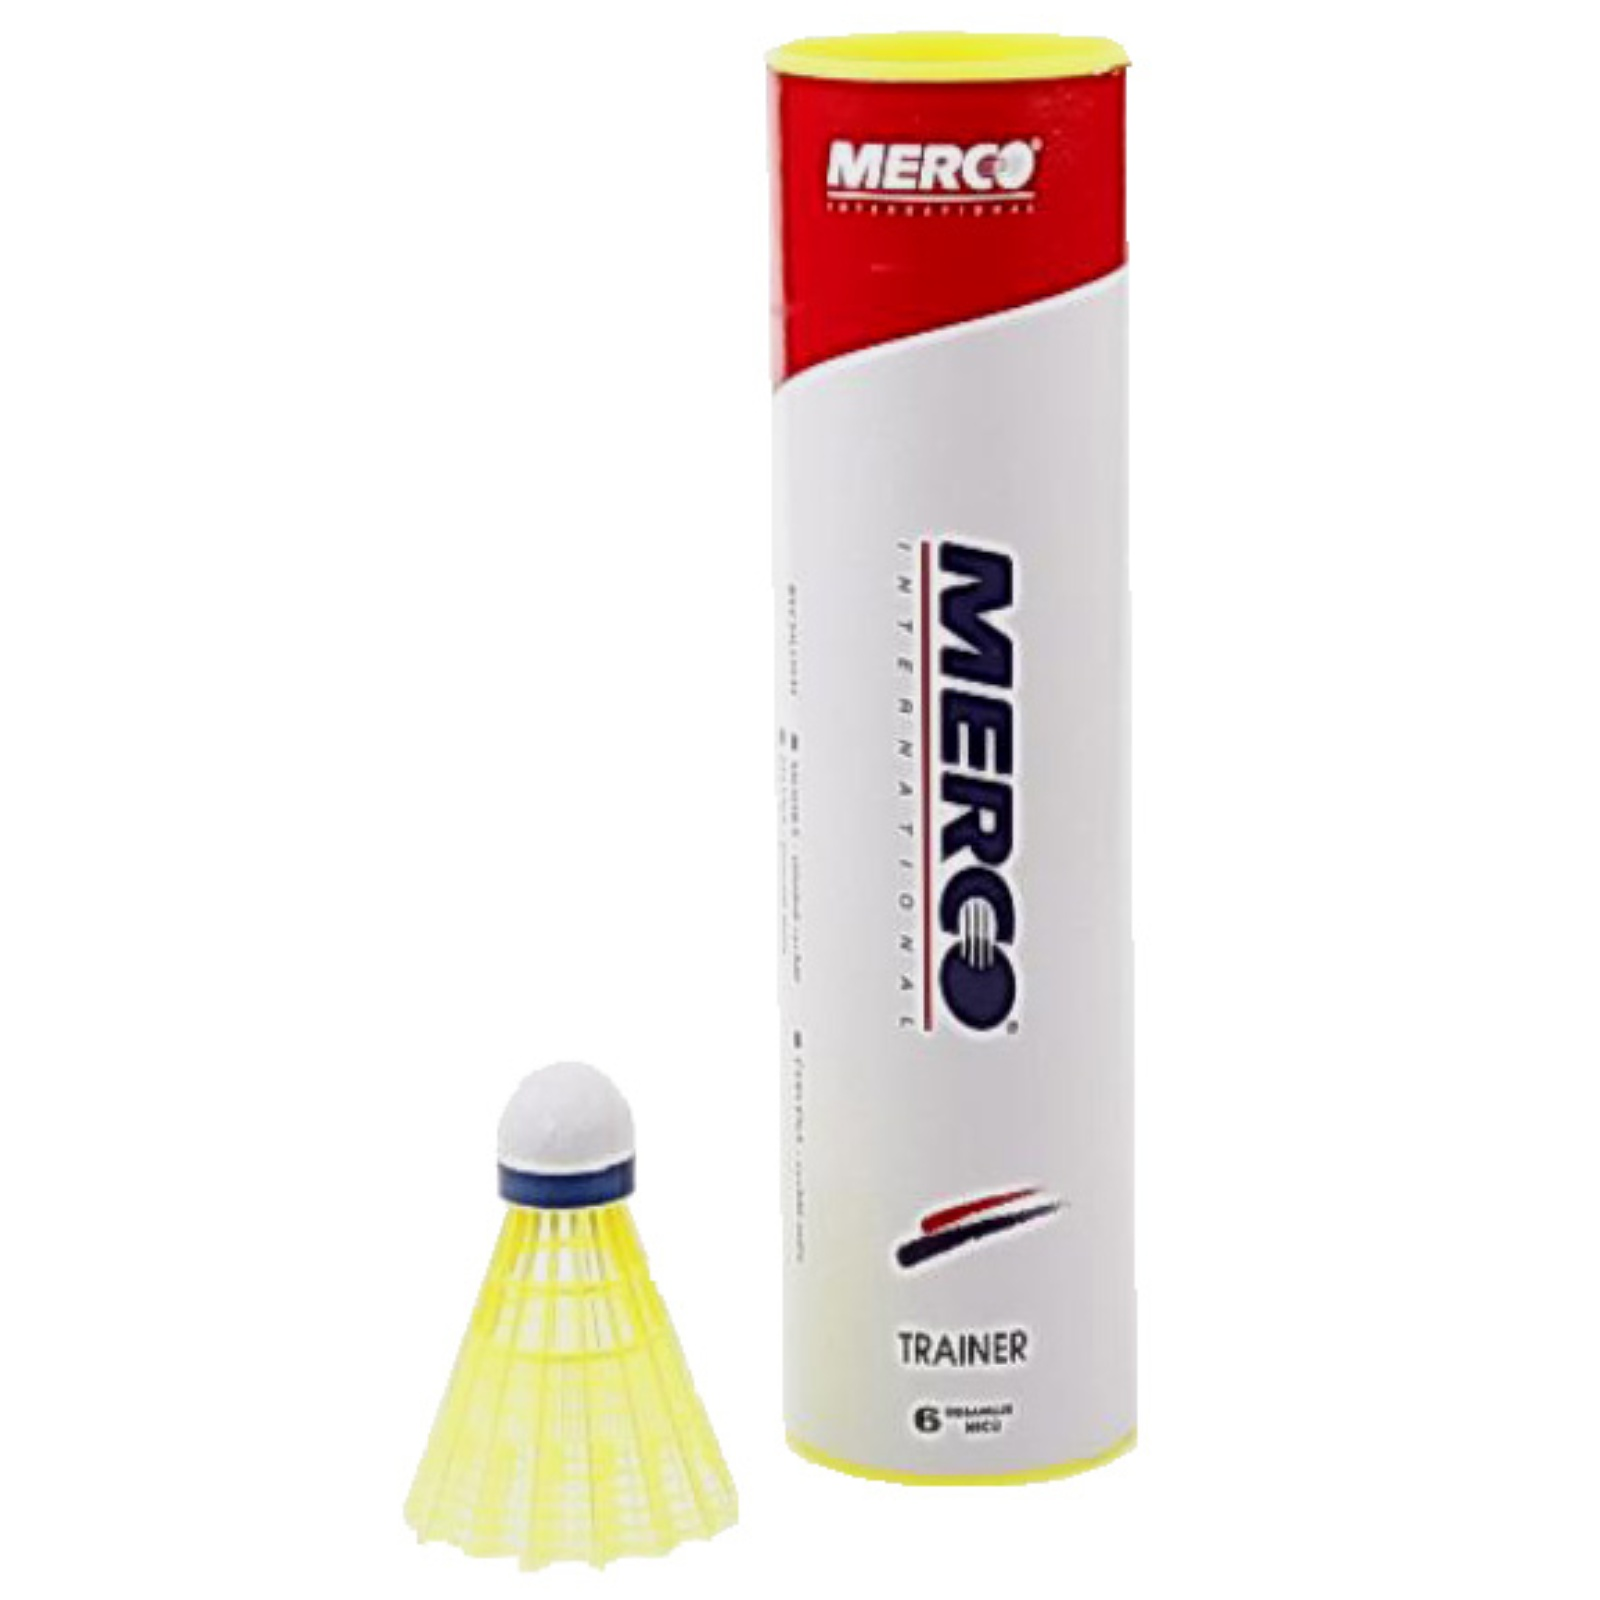 Badmintonové míčky MERCO Trainer Pro - modré, 6ks